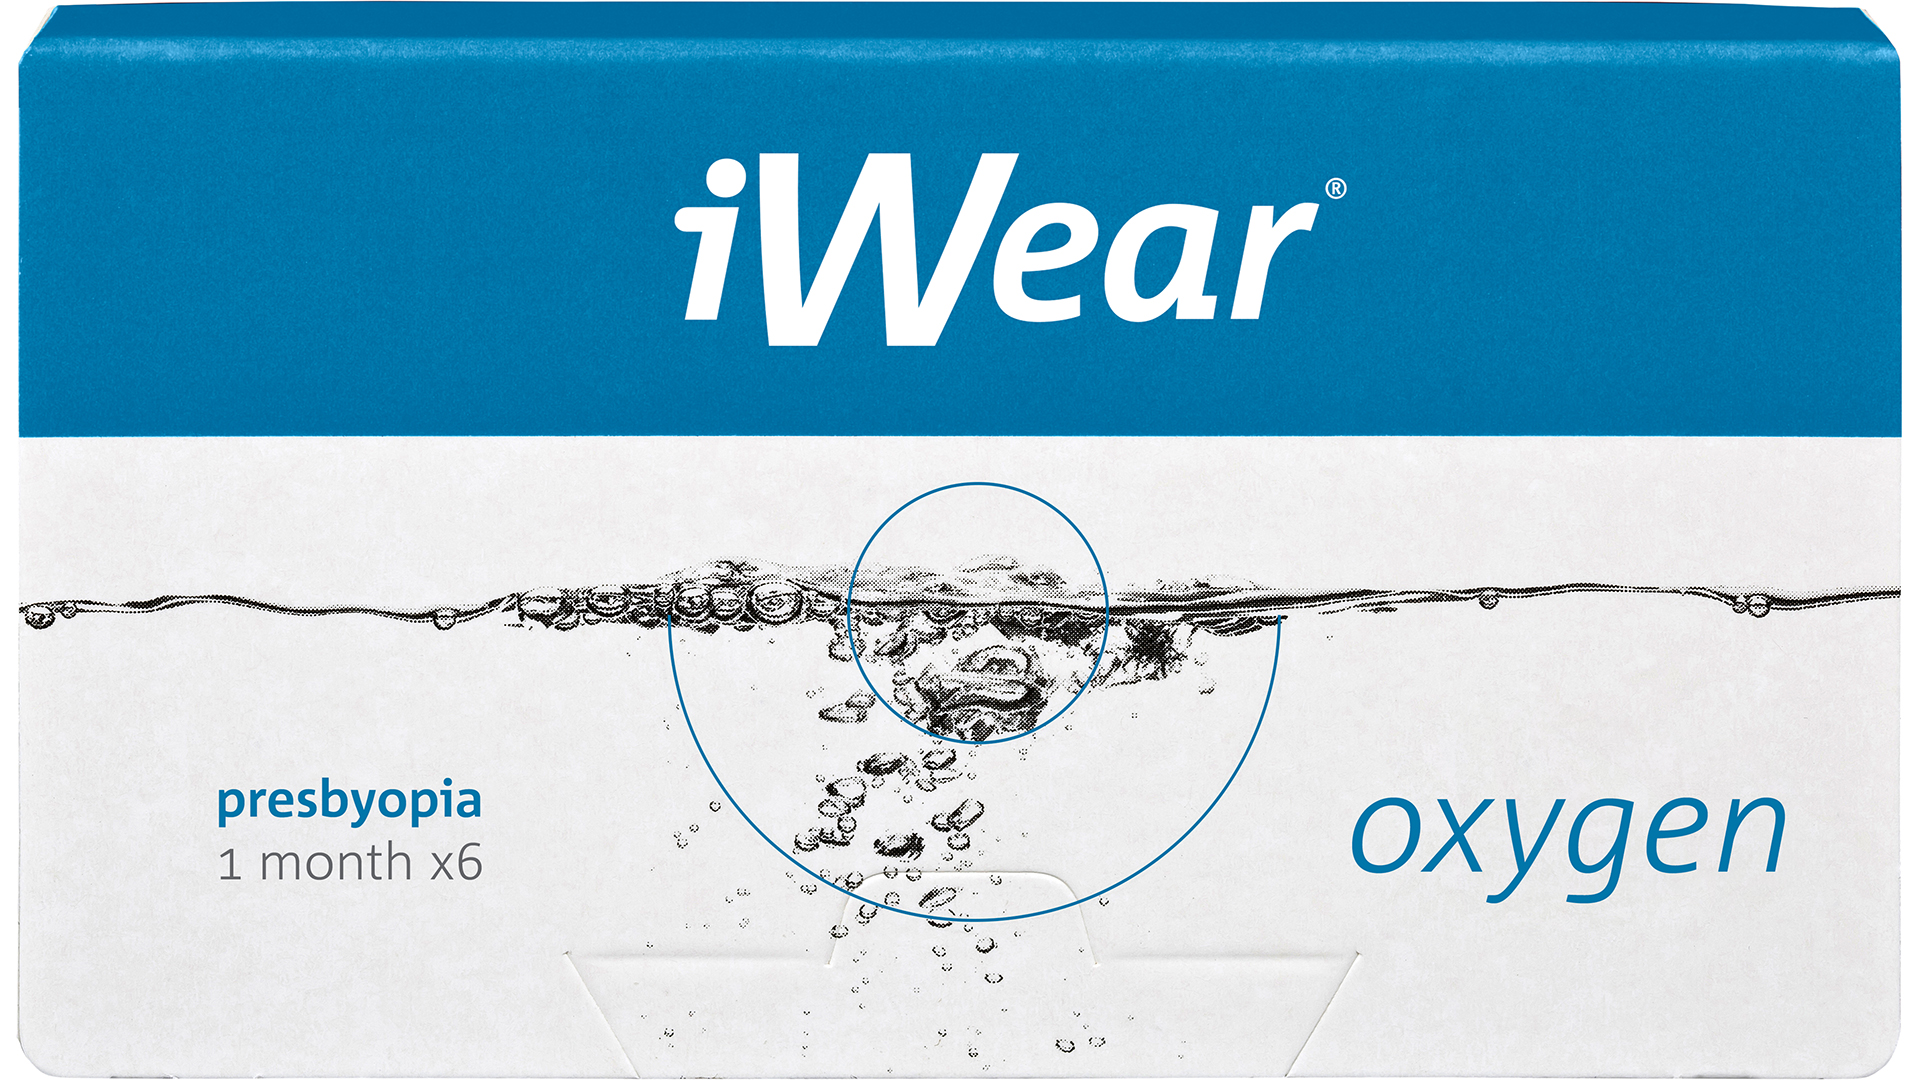 Front iWear oxygen presbyopia